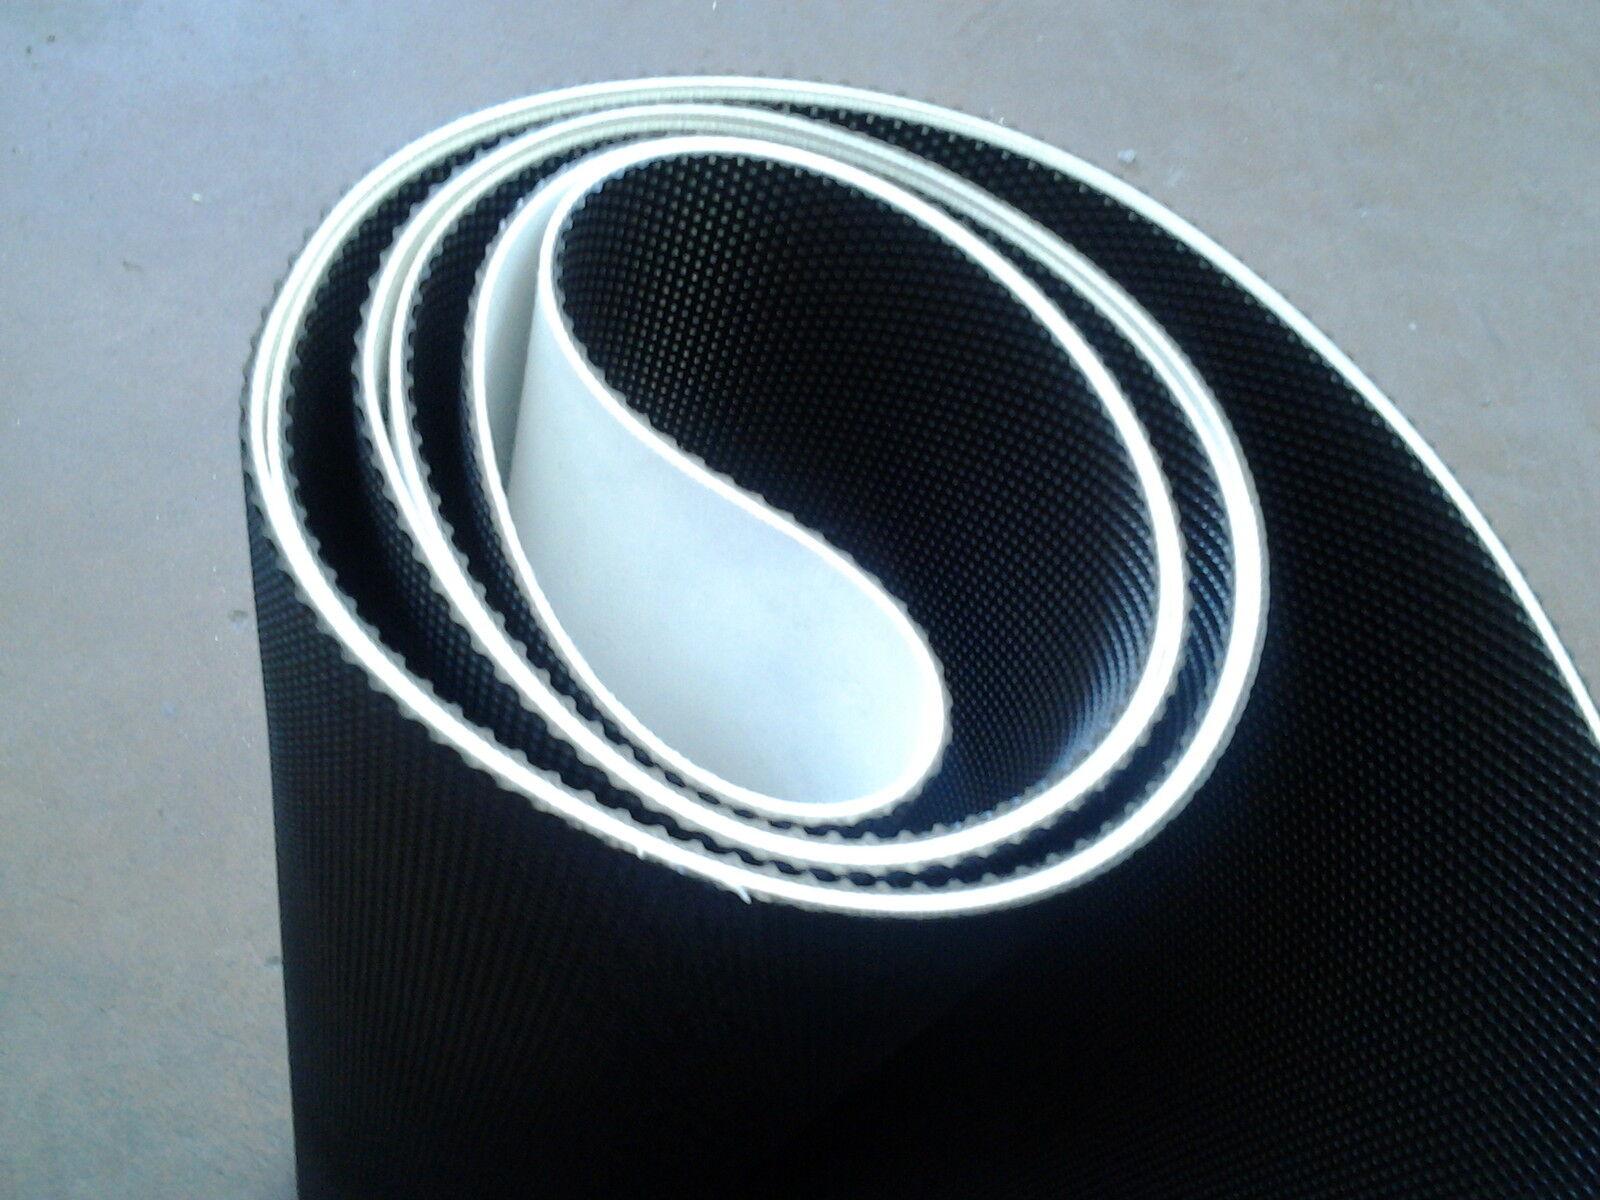 Nastro roulant tapis roulant Nastro di ricambio (tappeto) 73b382